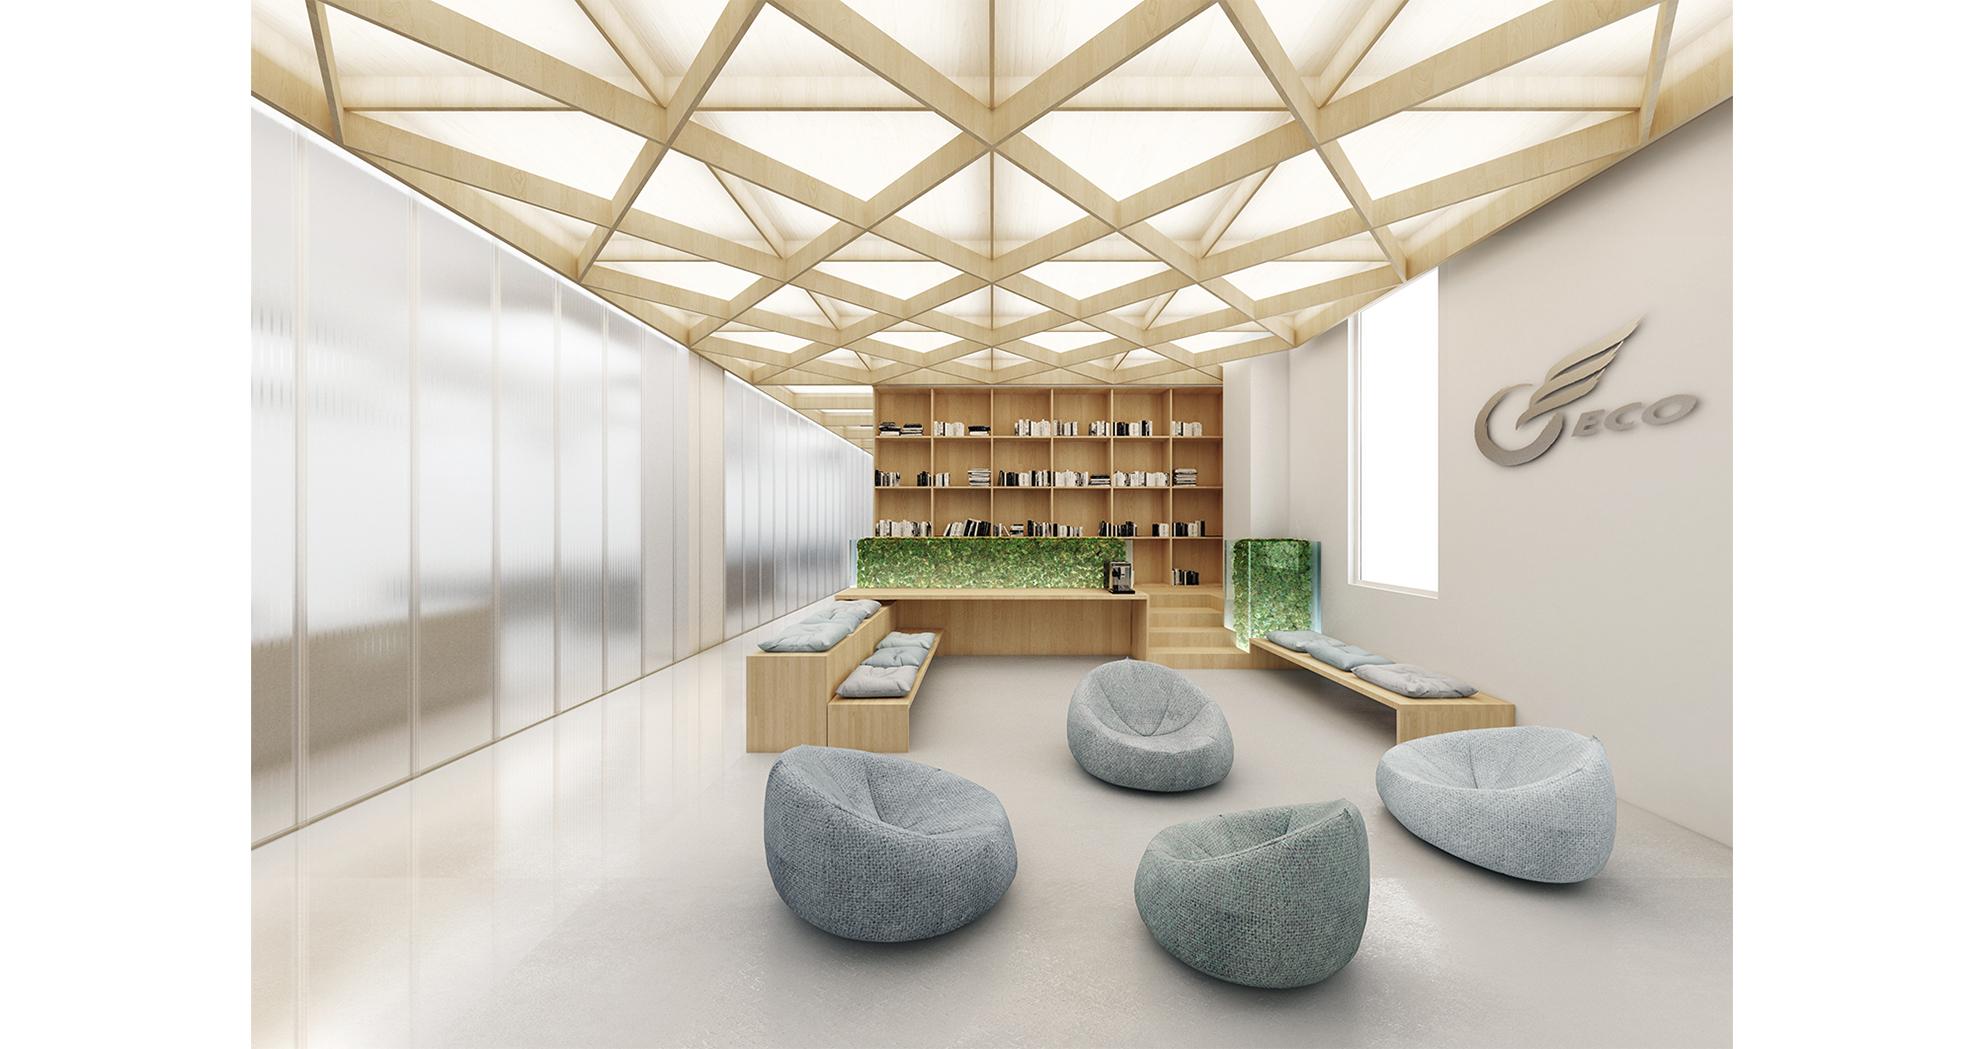 Second Floor - Common Space